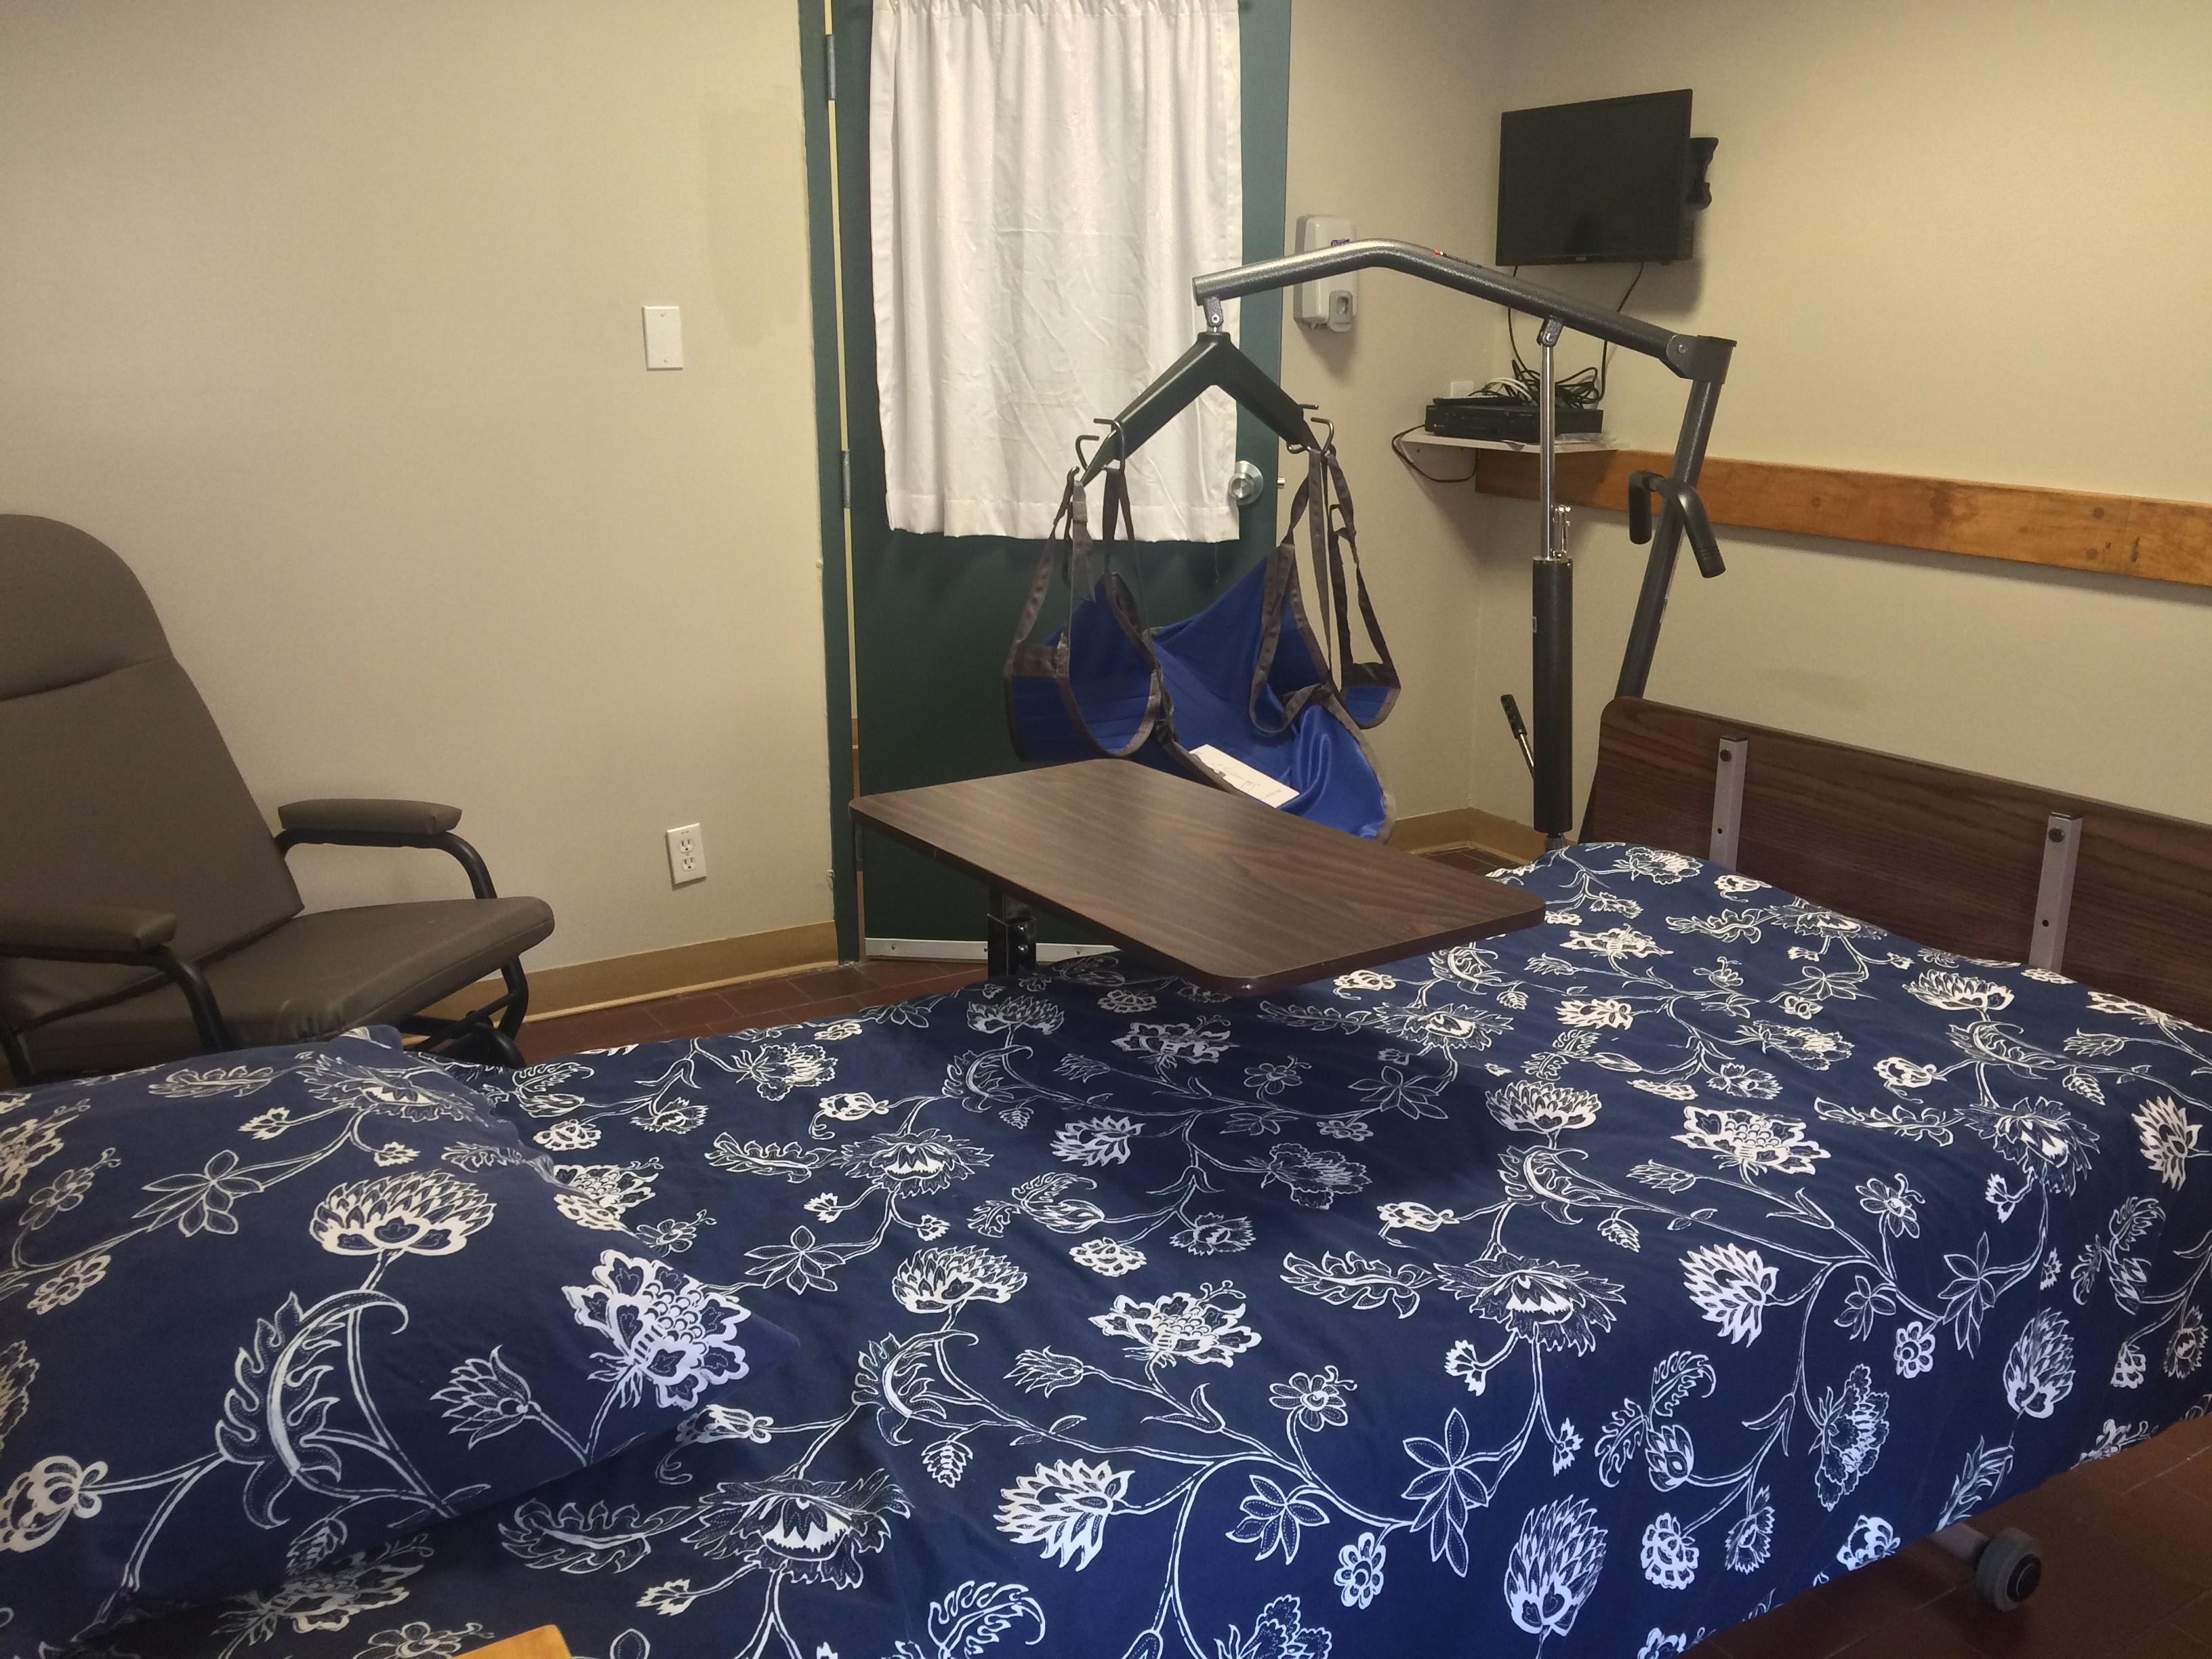 palliative care homeless maison du pere